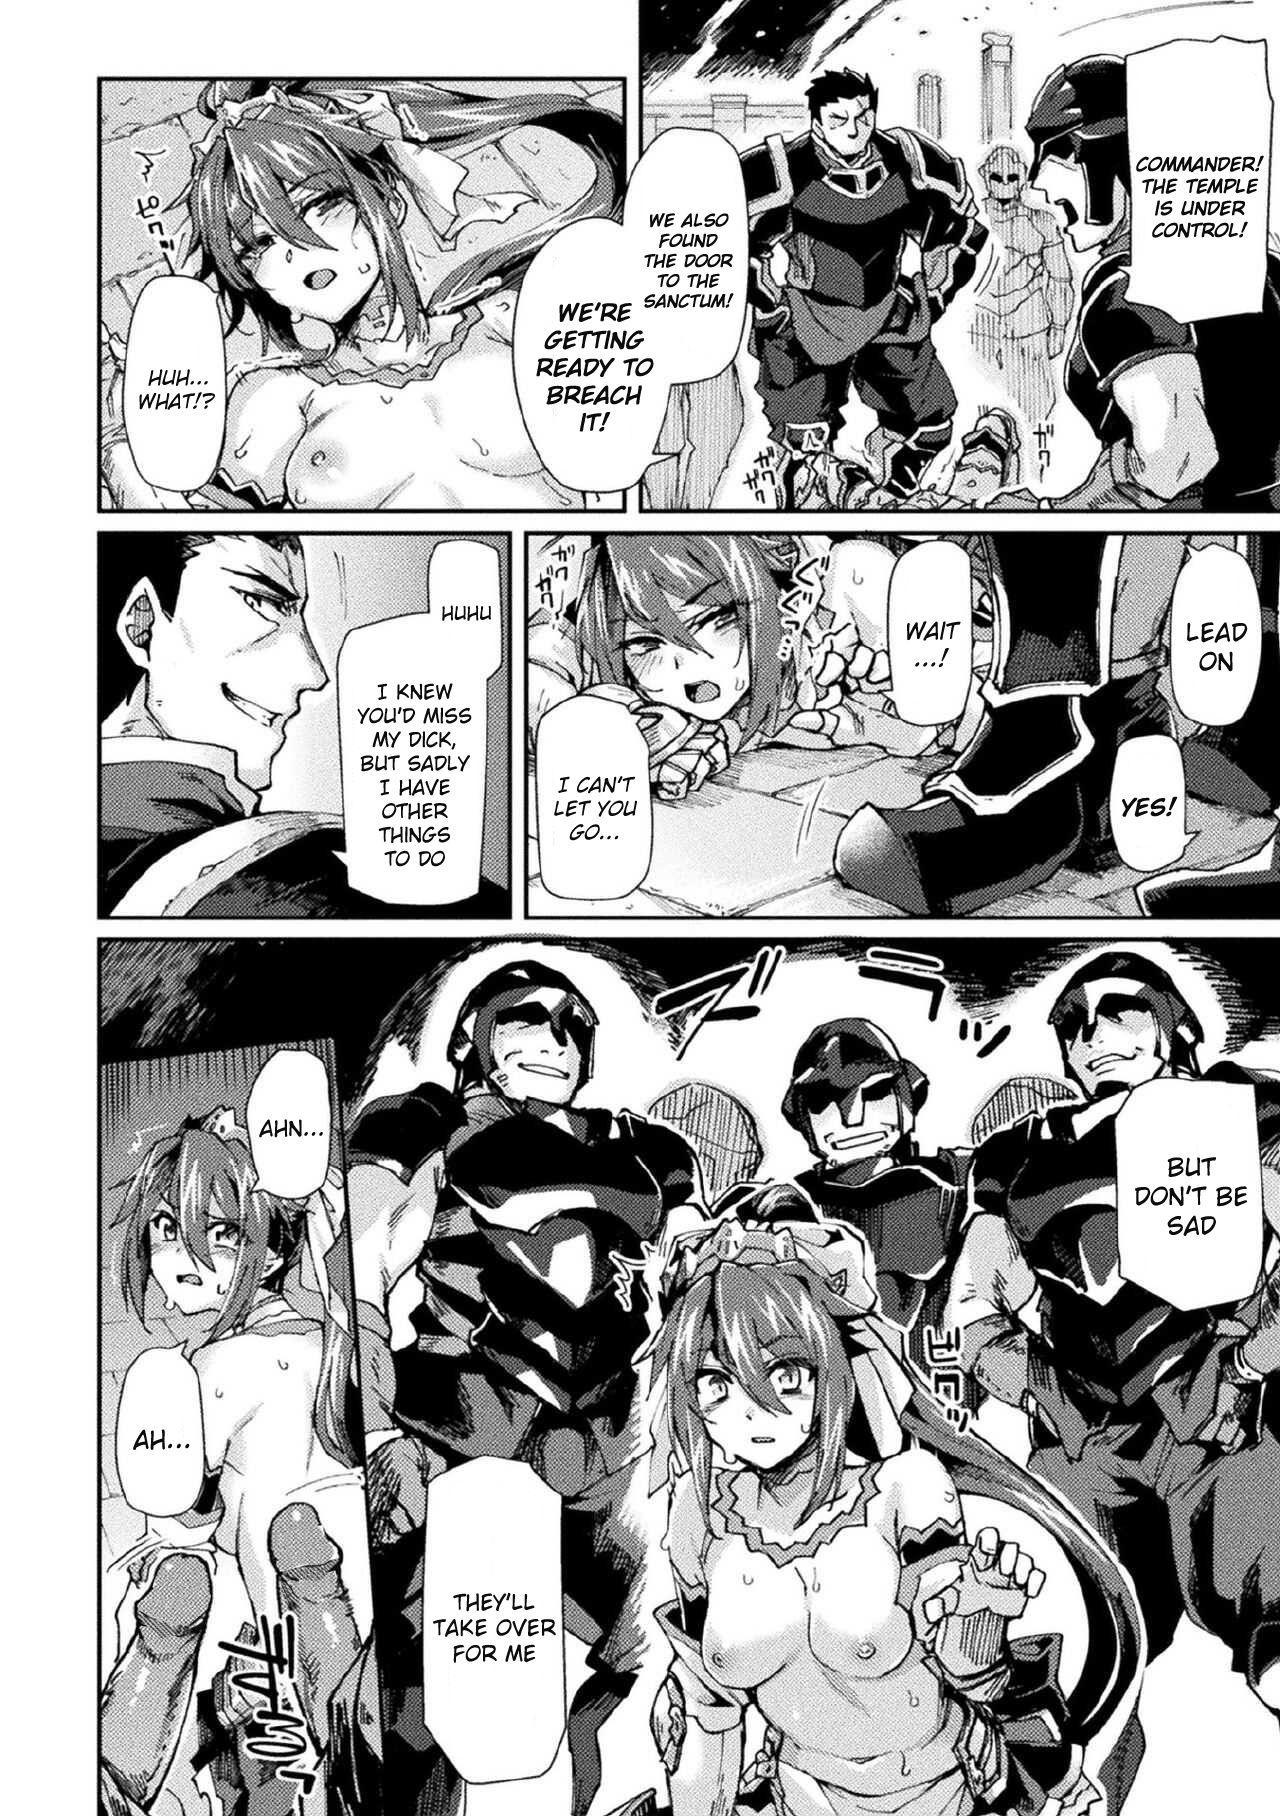 [Tsukitokage] Kuroinu II ~Inyoku ni Somaru Haitoku no Miyako, Futatabi~ THE COMIC Chapter 7 (Kukkoro Heroines Vol. 9) [English] [Decensored] (Klub Kemoner) [Digital] 13